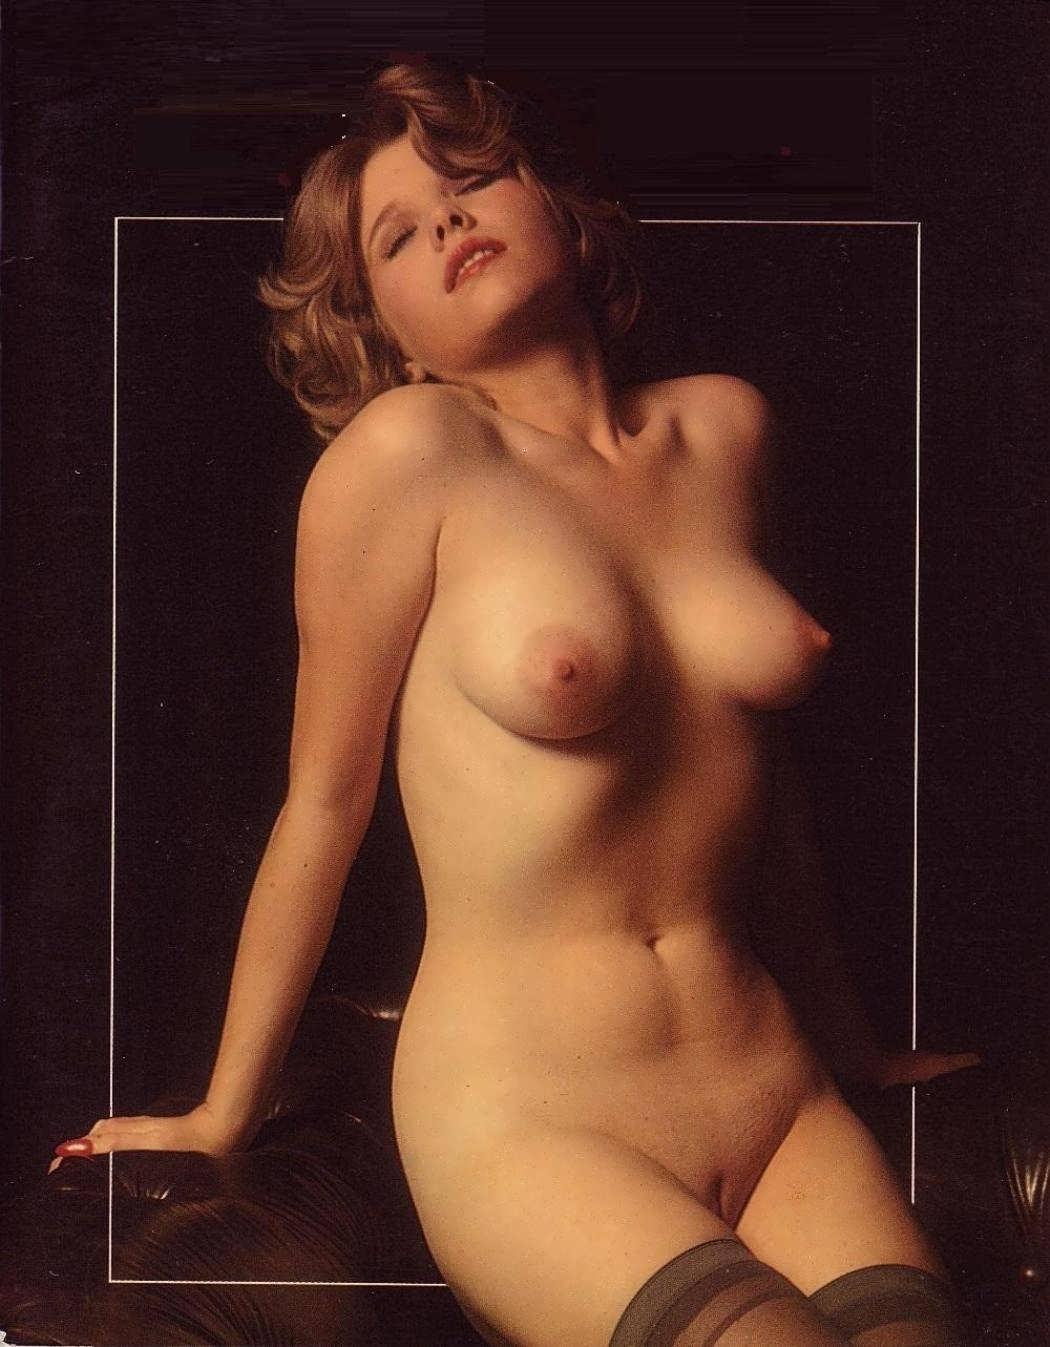 Ретро эротика цветное фото 15 фотография